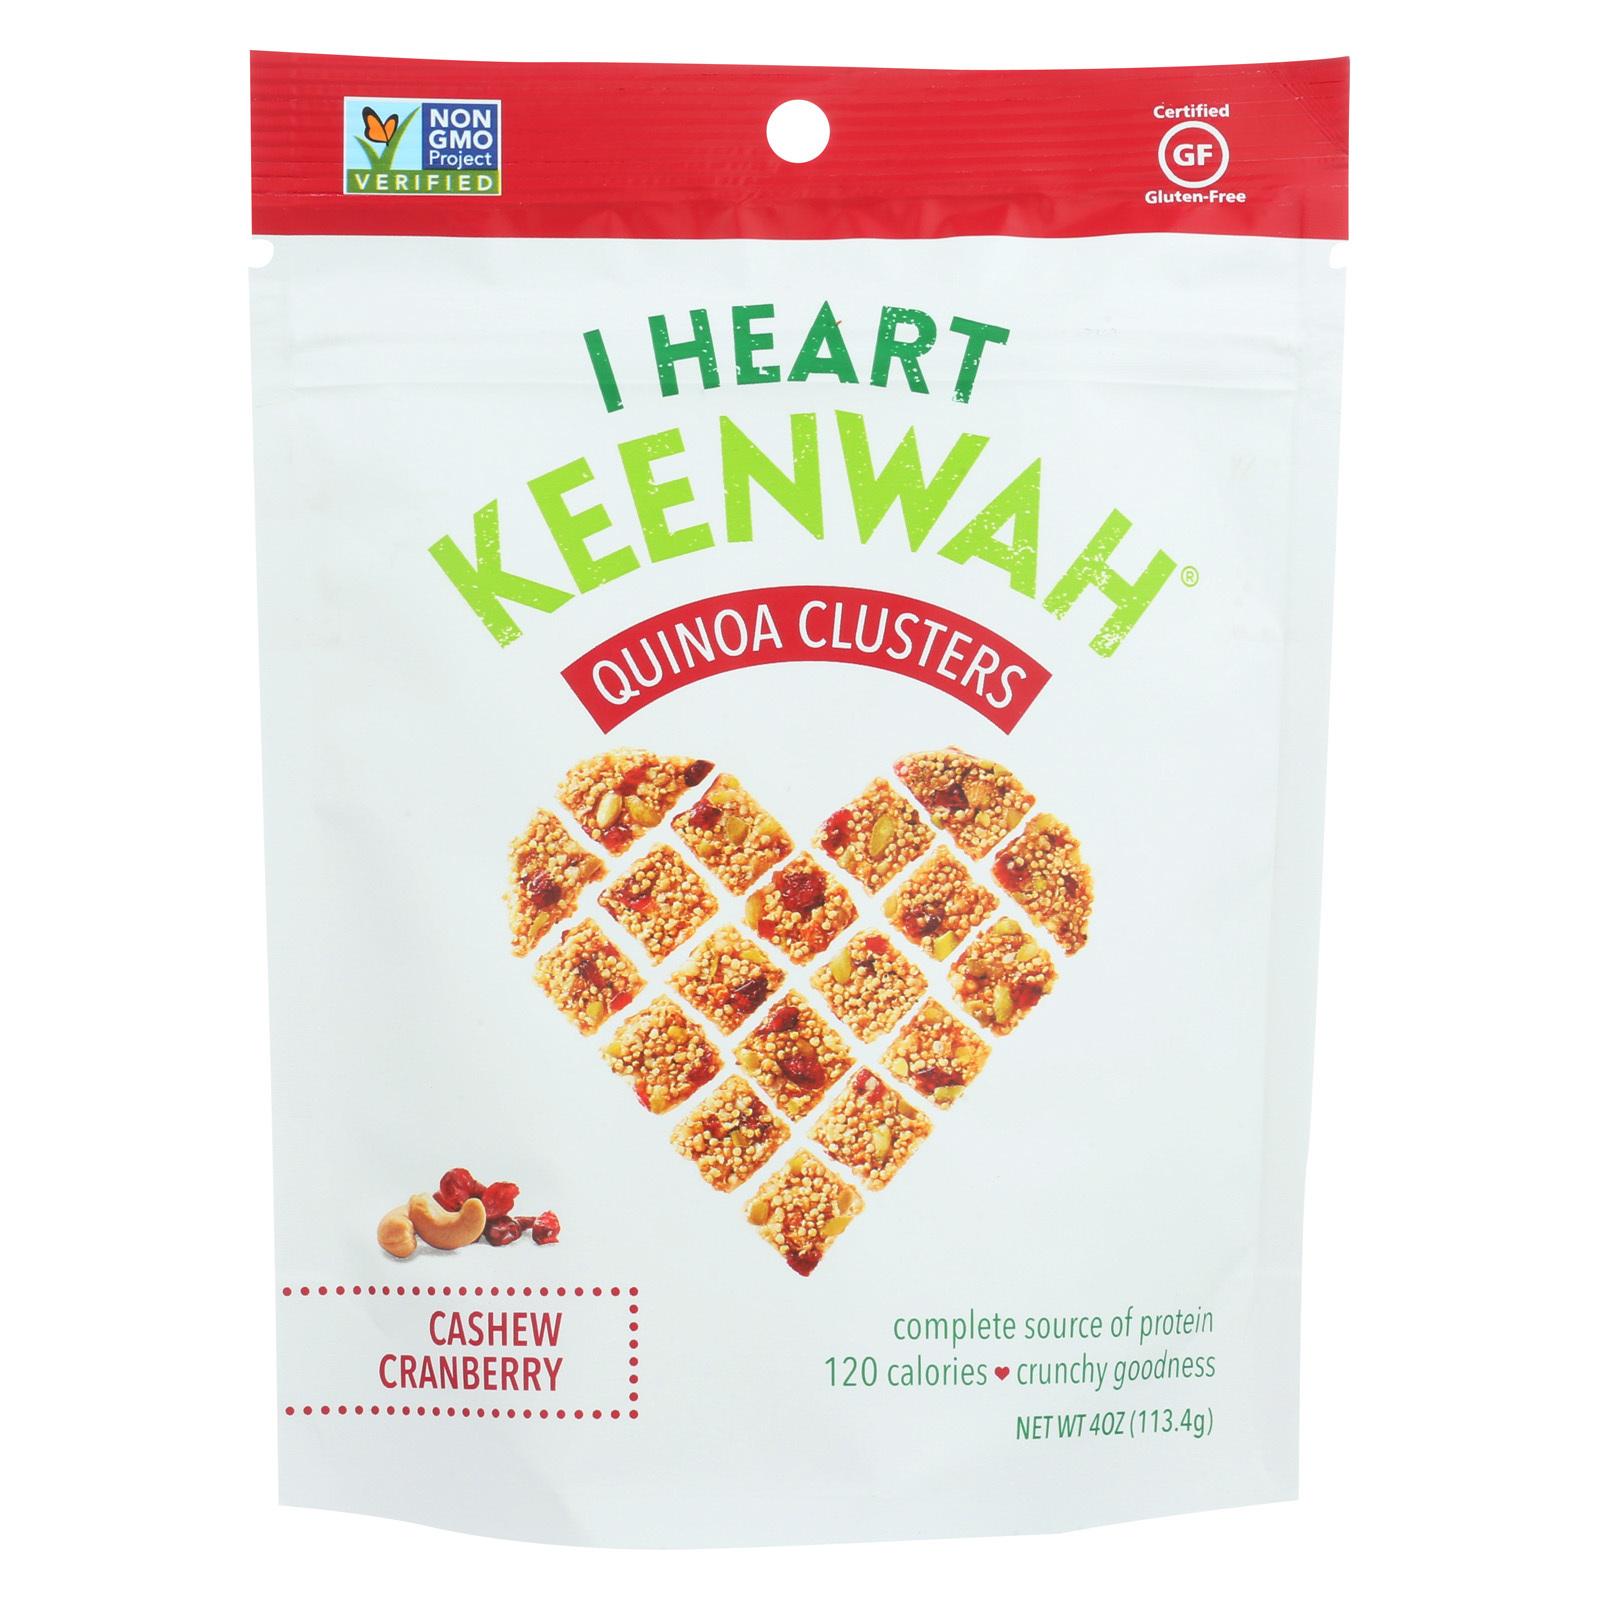 I Heart Keenwah Quinoa Cluster - Cashew Berry - Case of 6 - 4 oz.